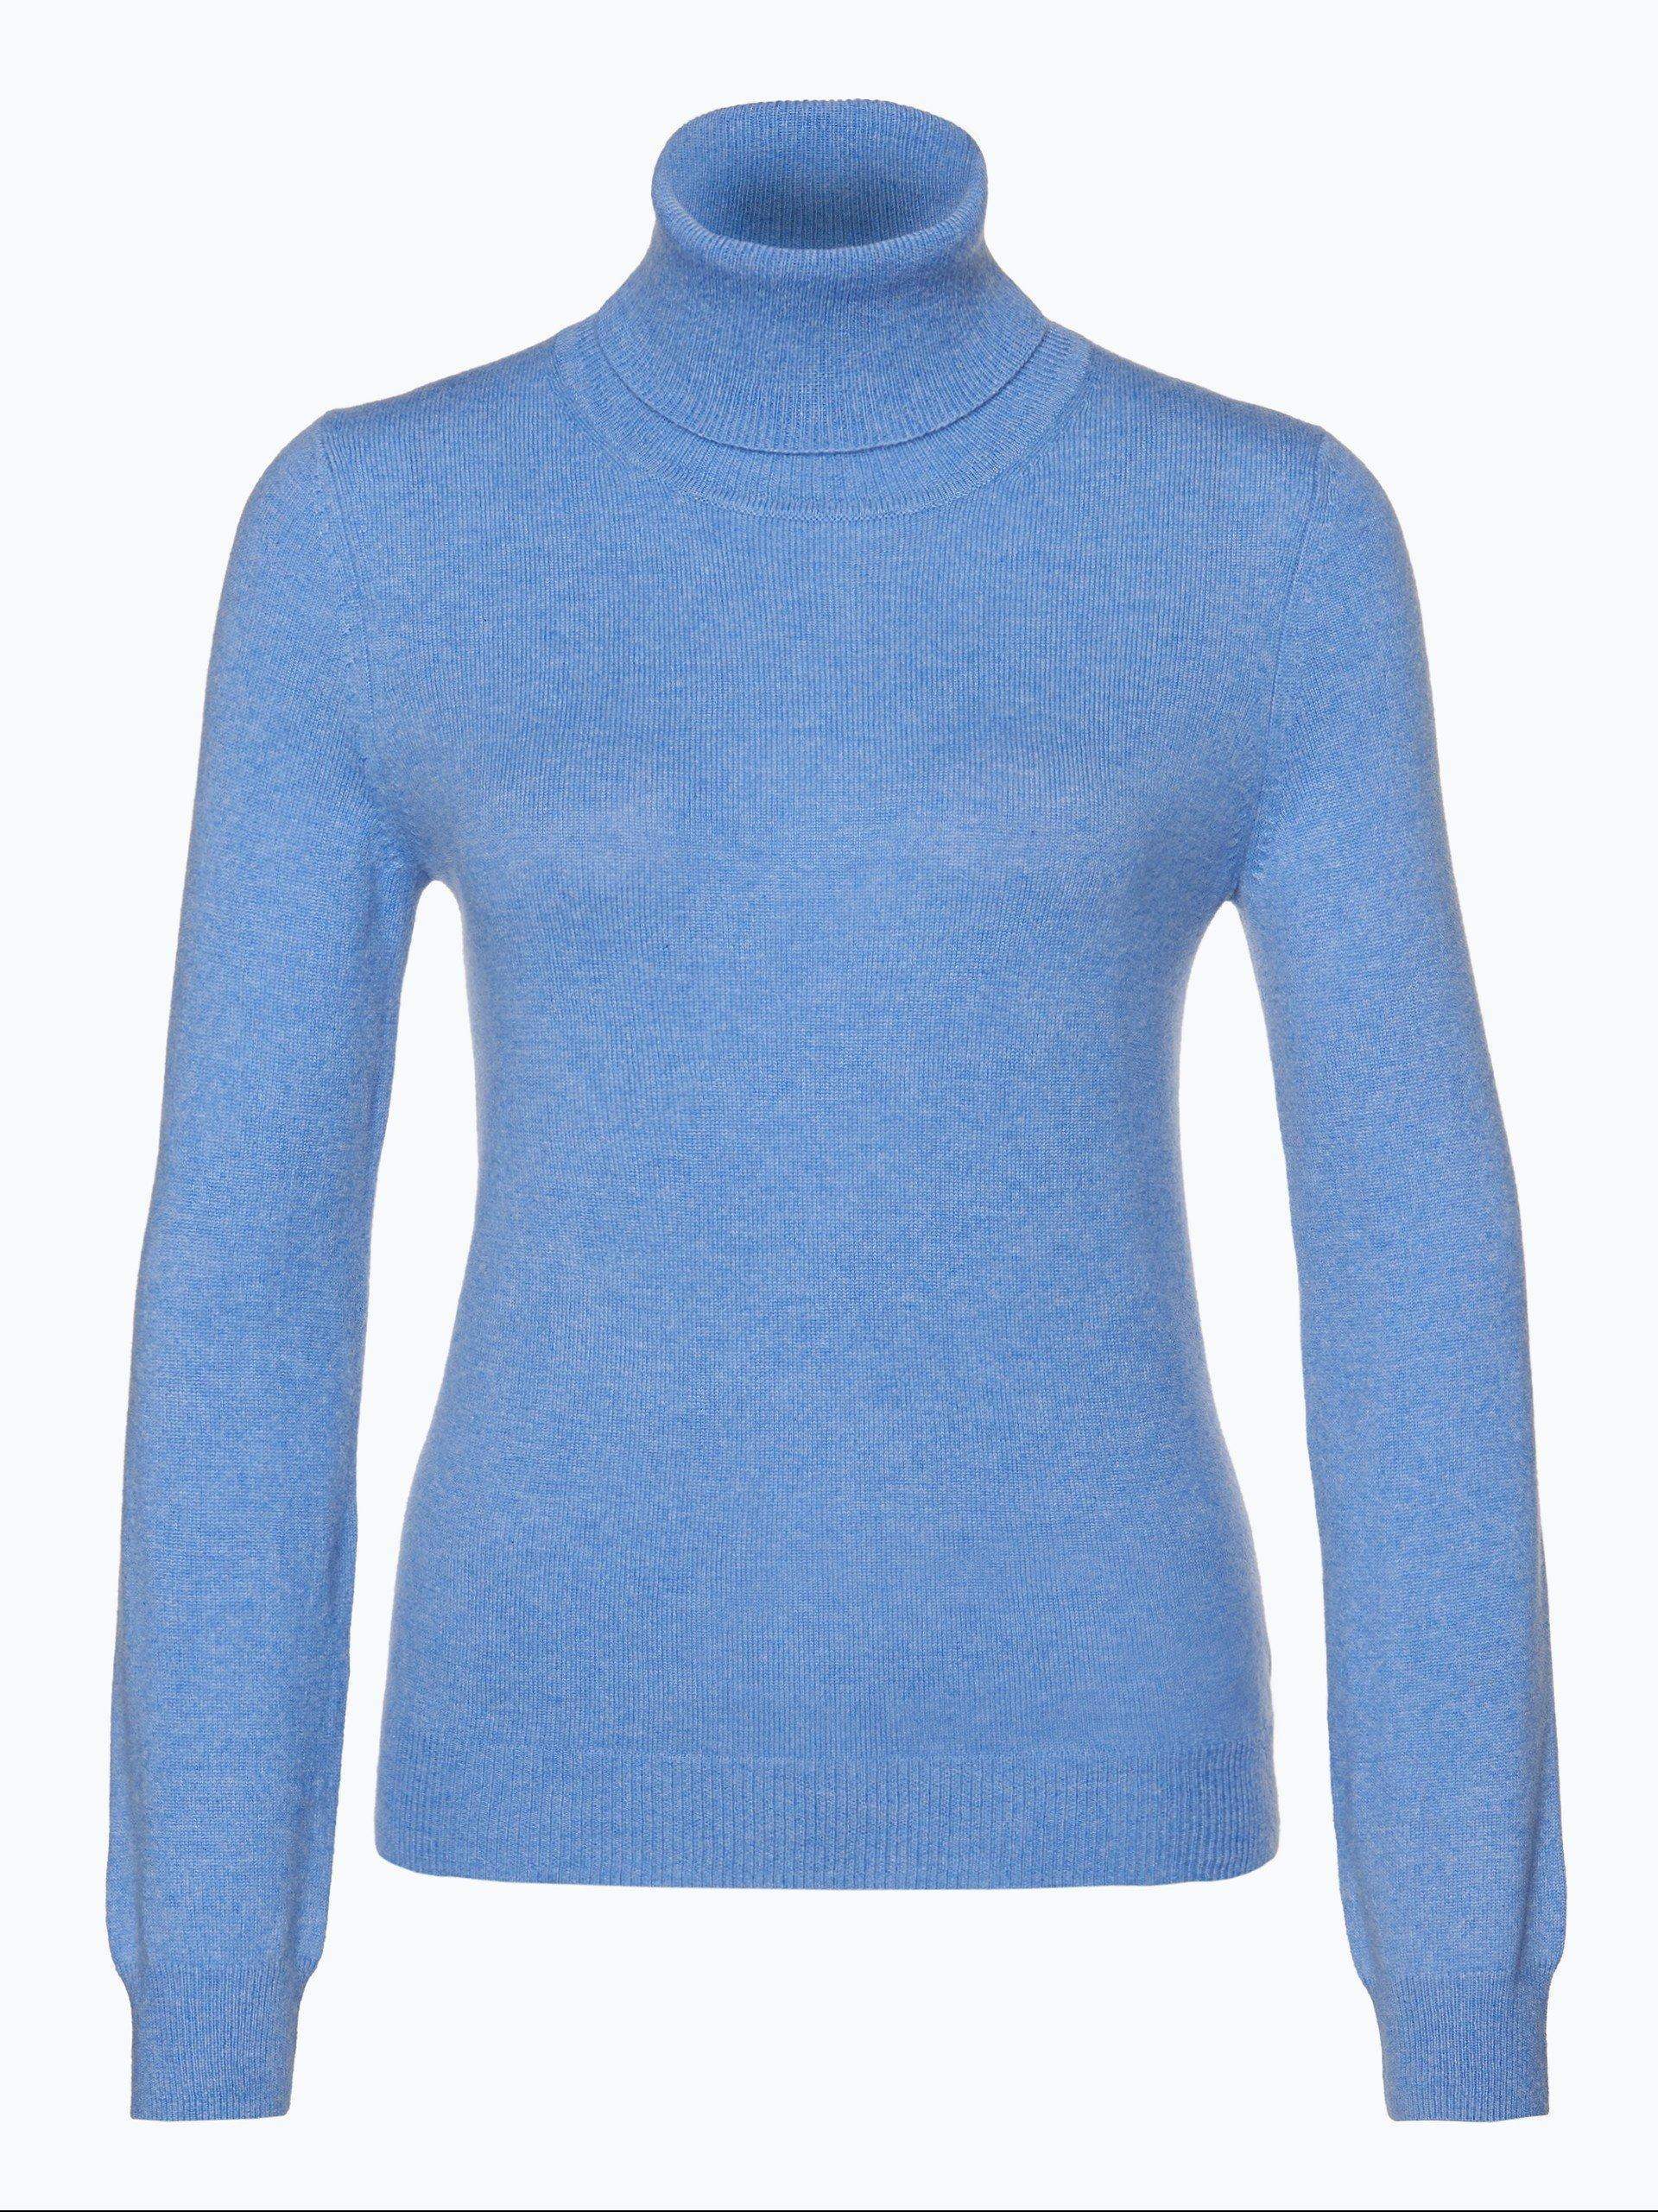 franco callegari damen pure cashmere pullover blau uni. Black Bedroom Furniture Sets. Home Design Ideas